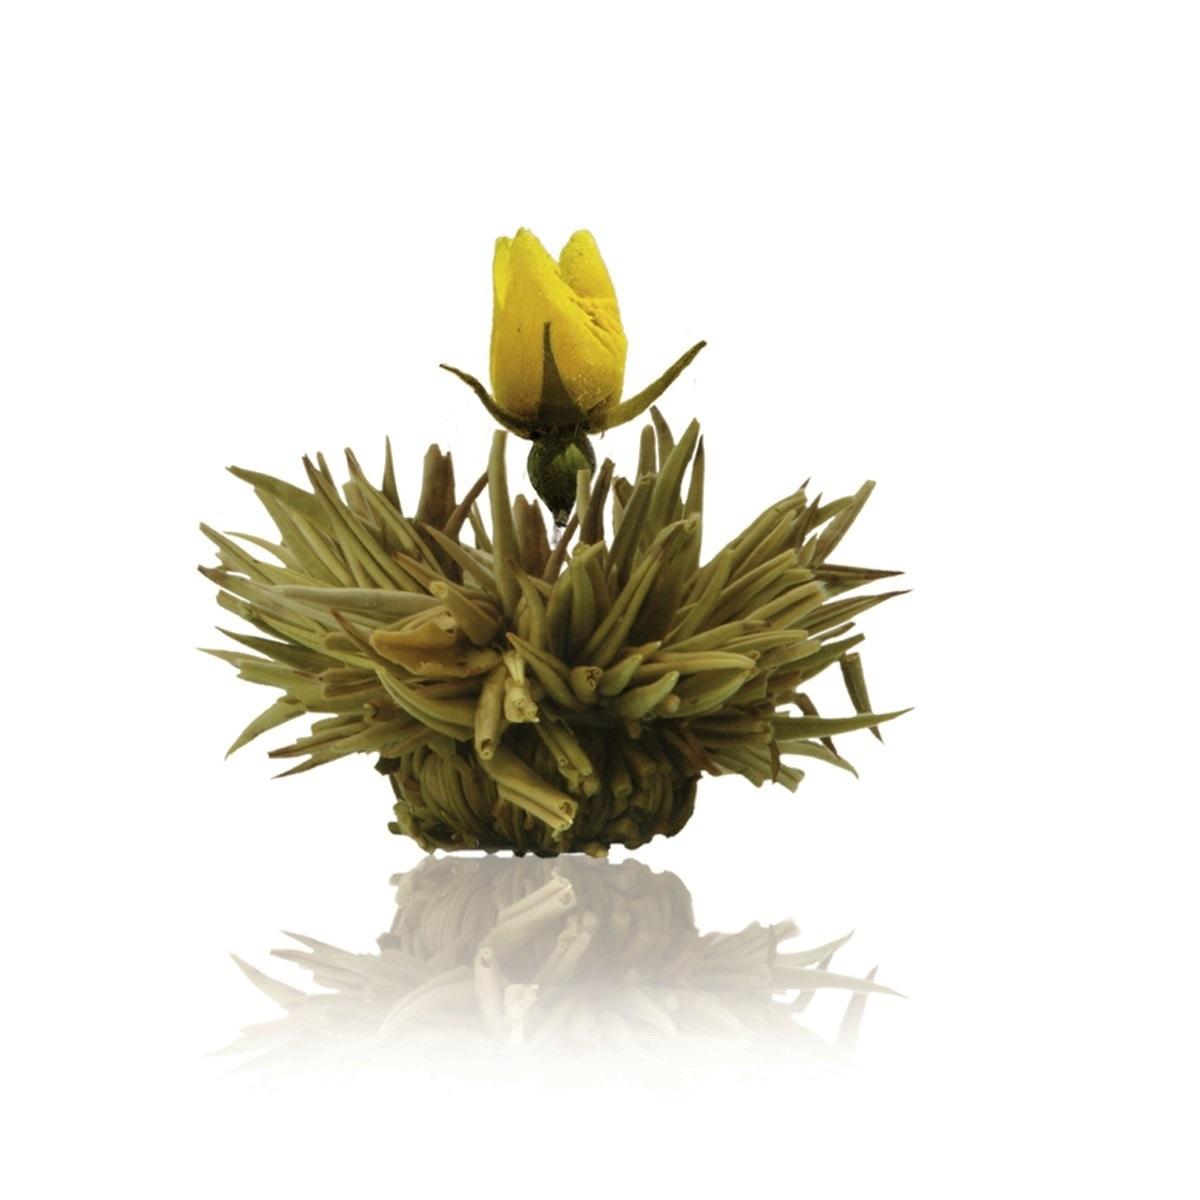 Floare de ceai alb si trandafir galben